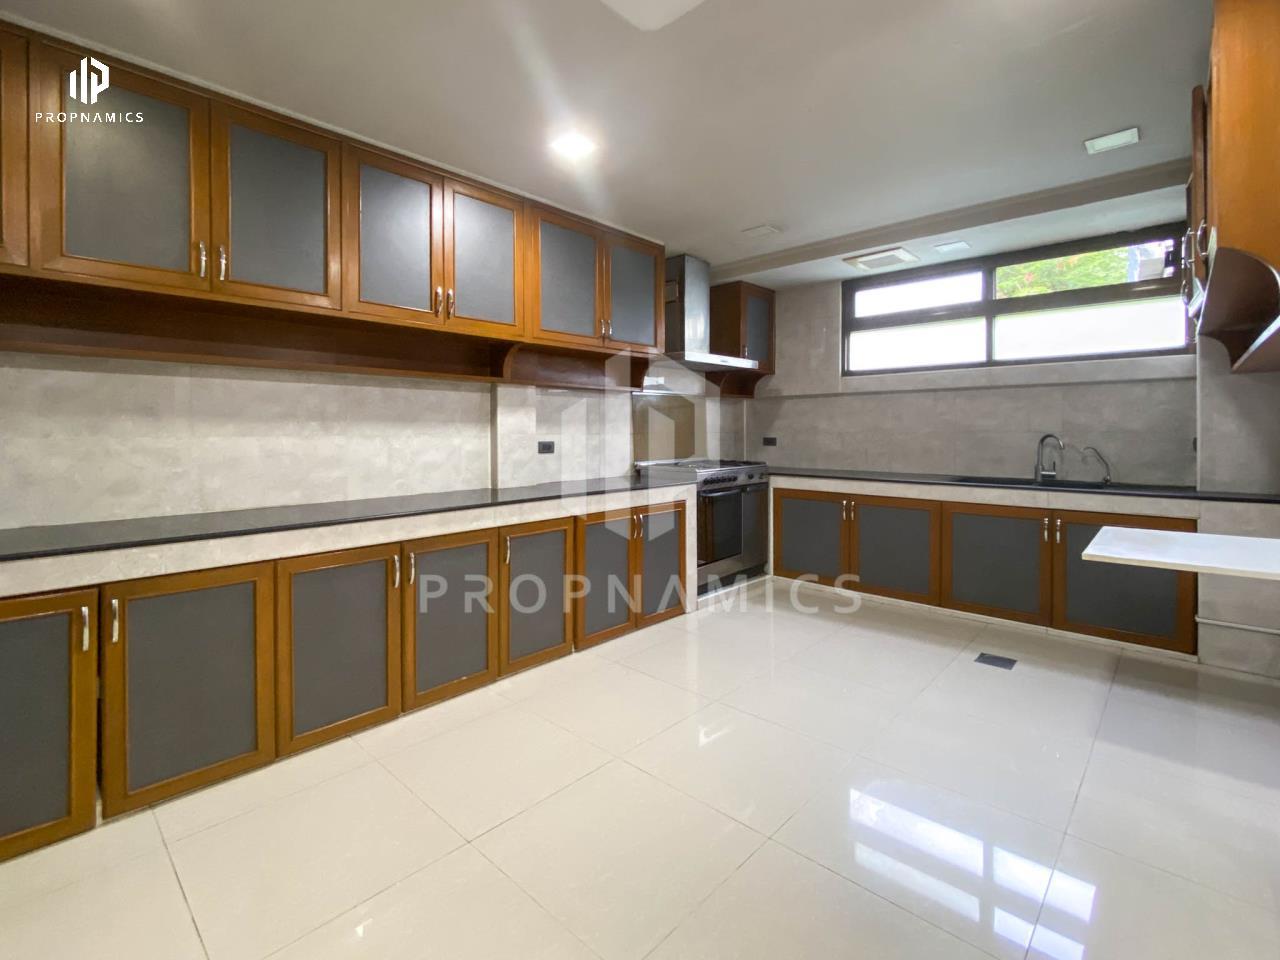 Propnamics Co., Ltd Agency's FOR RENT: SINGLE HOUSE IN SUKHUMVIT 26 7